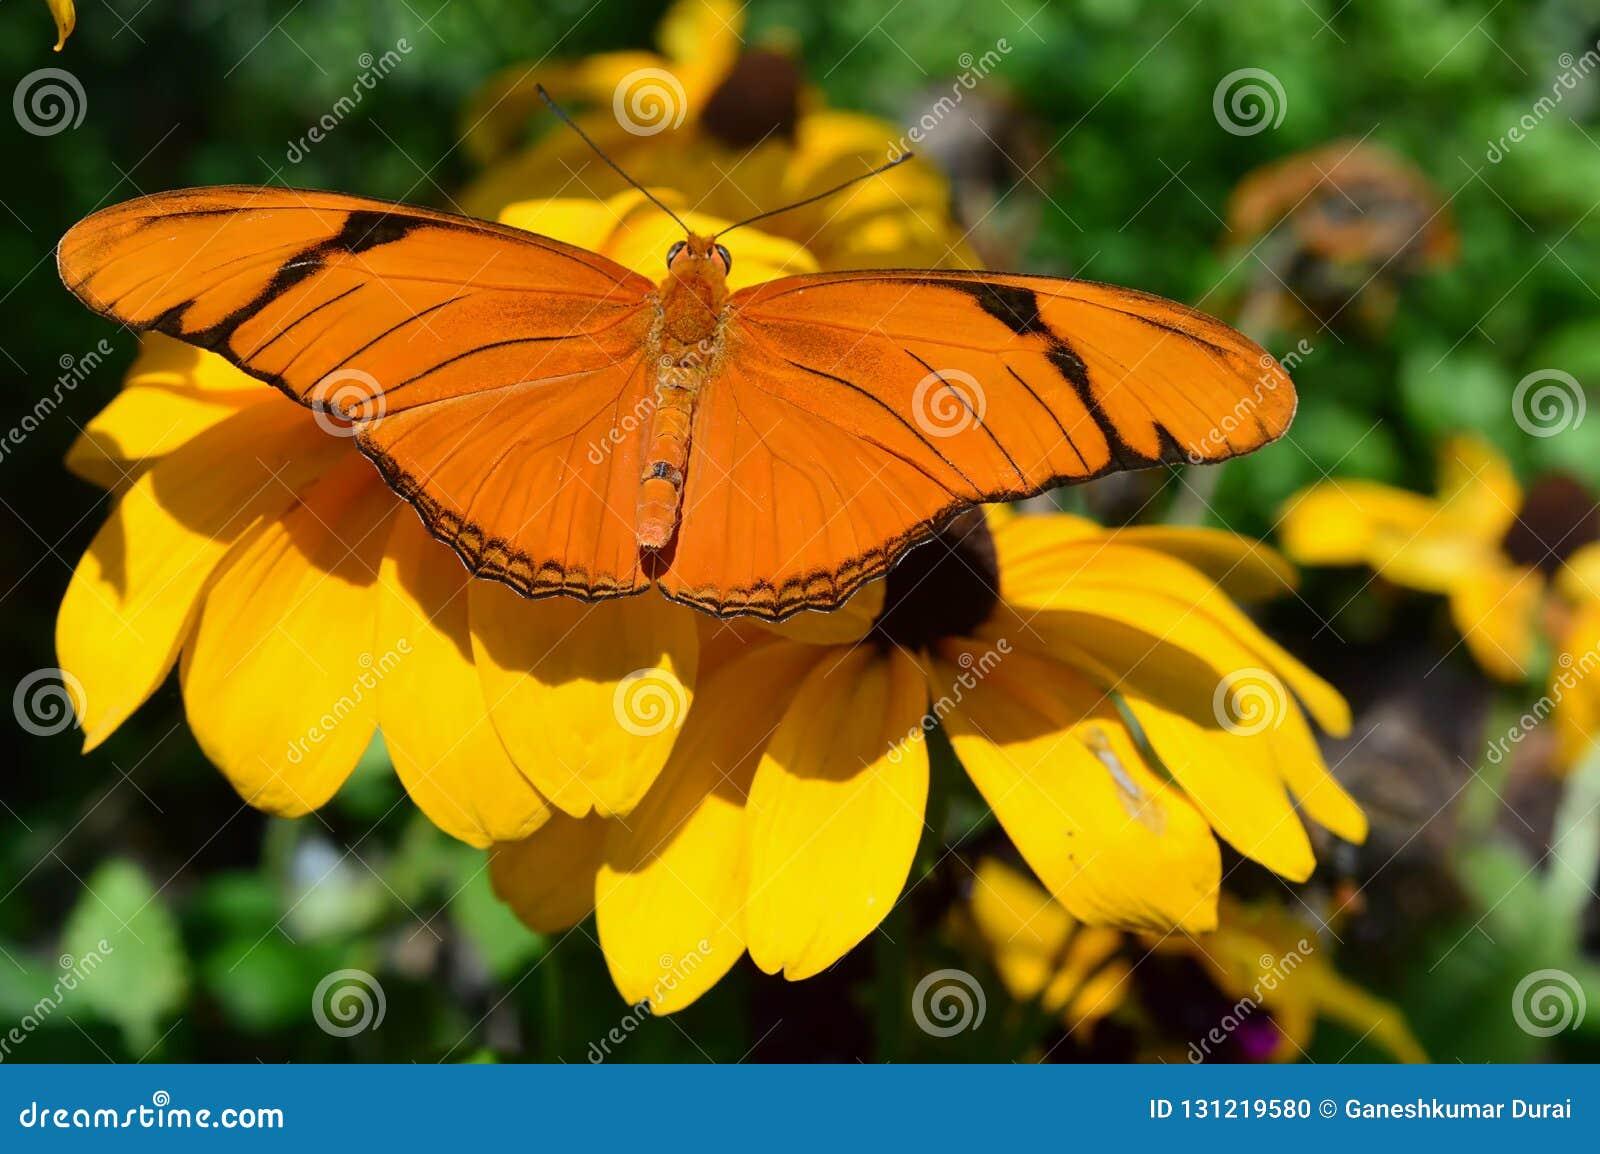 Orange Gulf Fritillary Butterfly